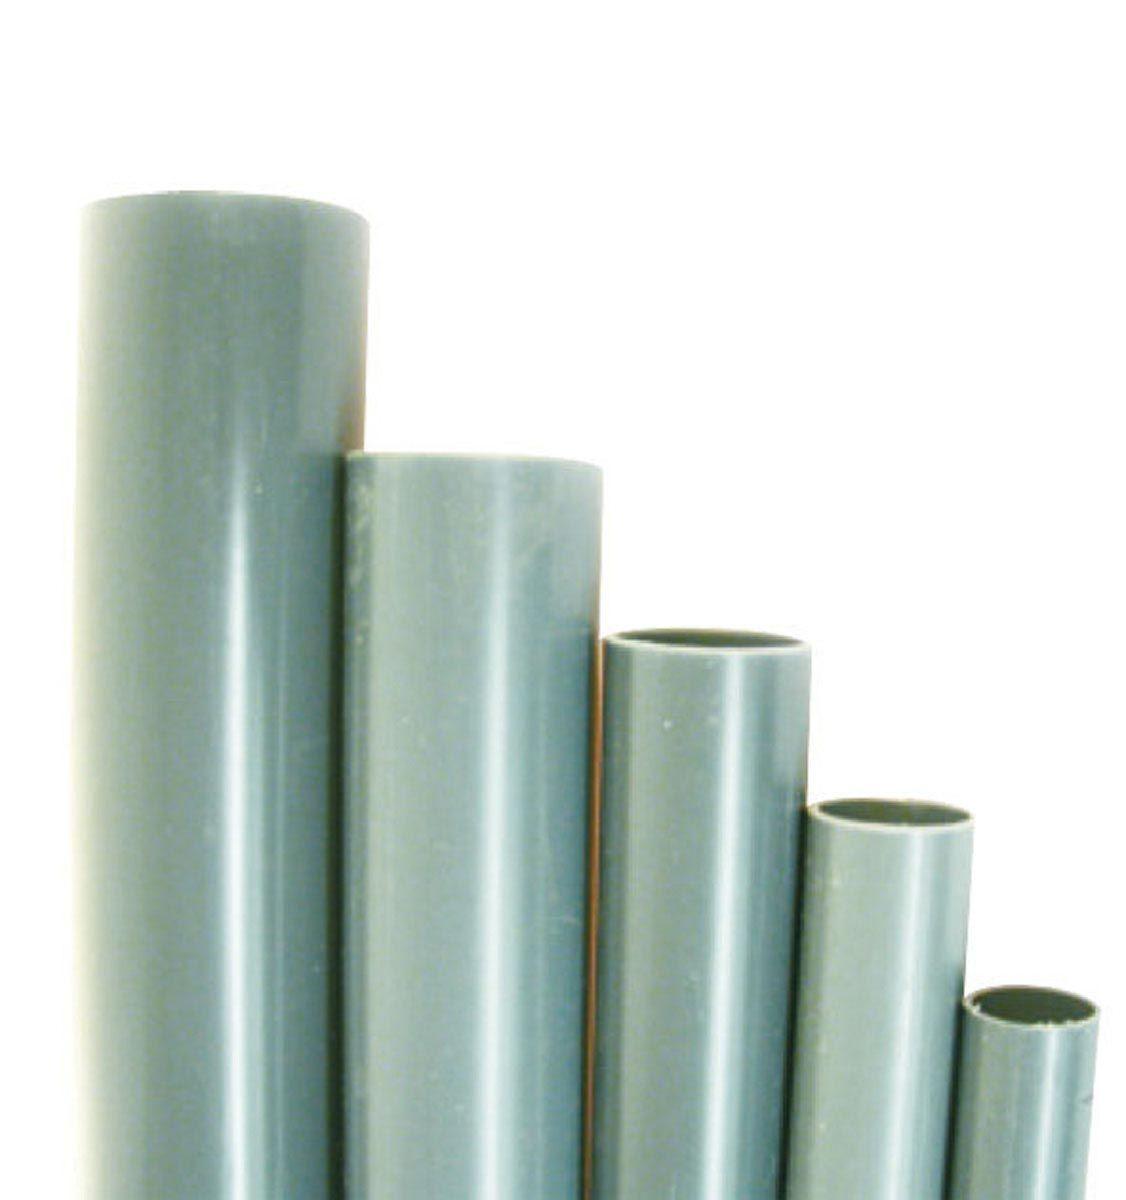 Rohr, aus PVC, grau, L 1 m, D20 x 1.5 mm, PN 16